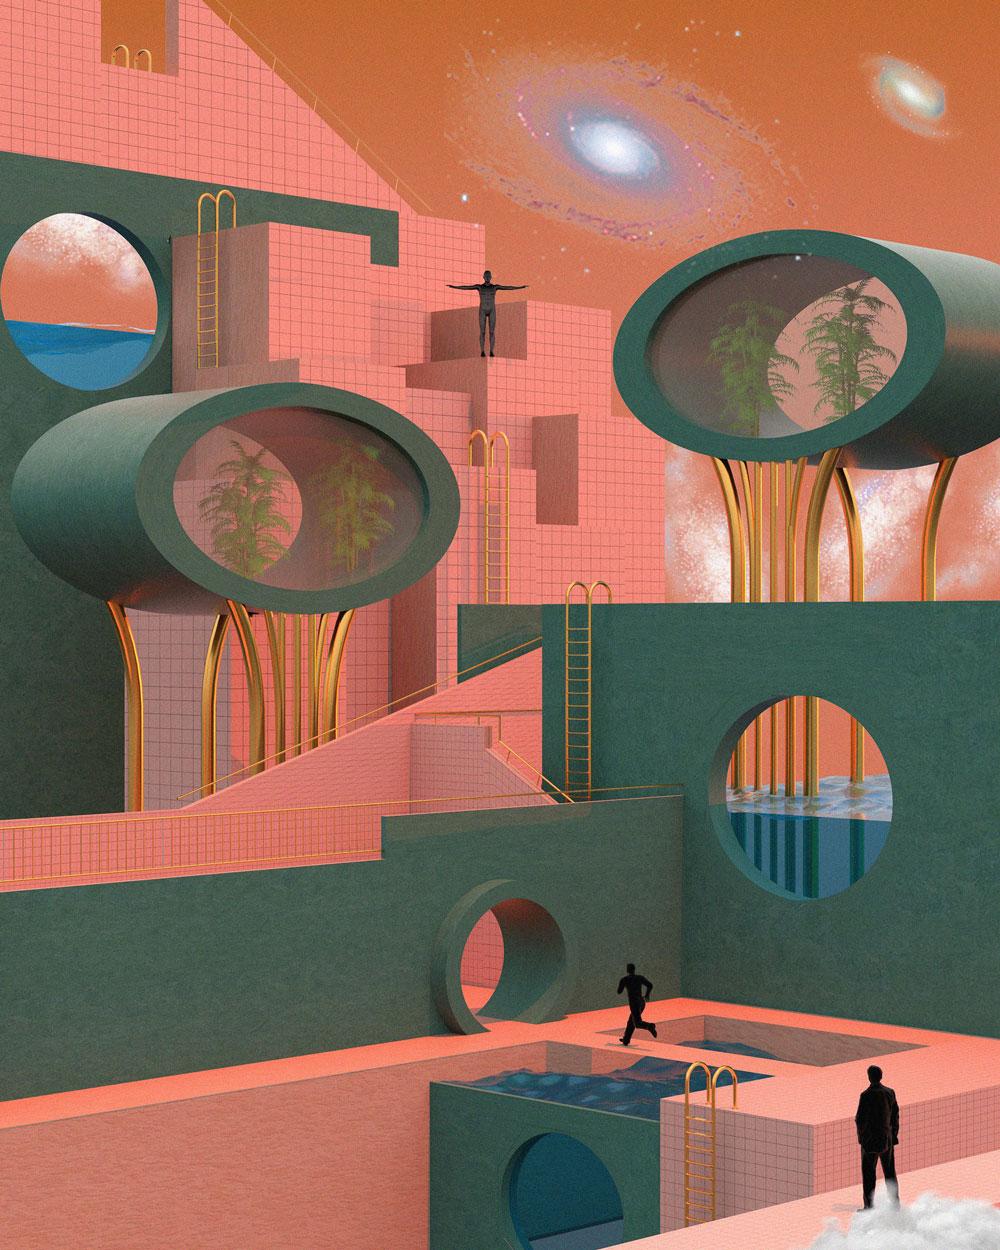 Tishk-Barzanji-Visual-Atelier-8-Squarespace-Interview-16.jpg